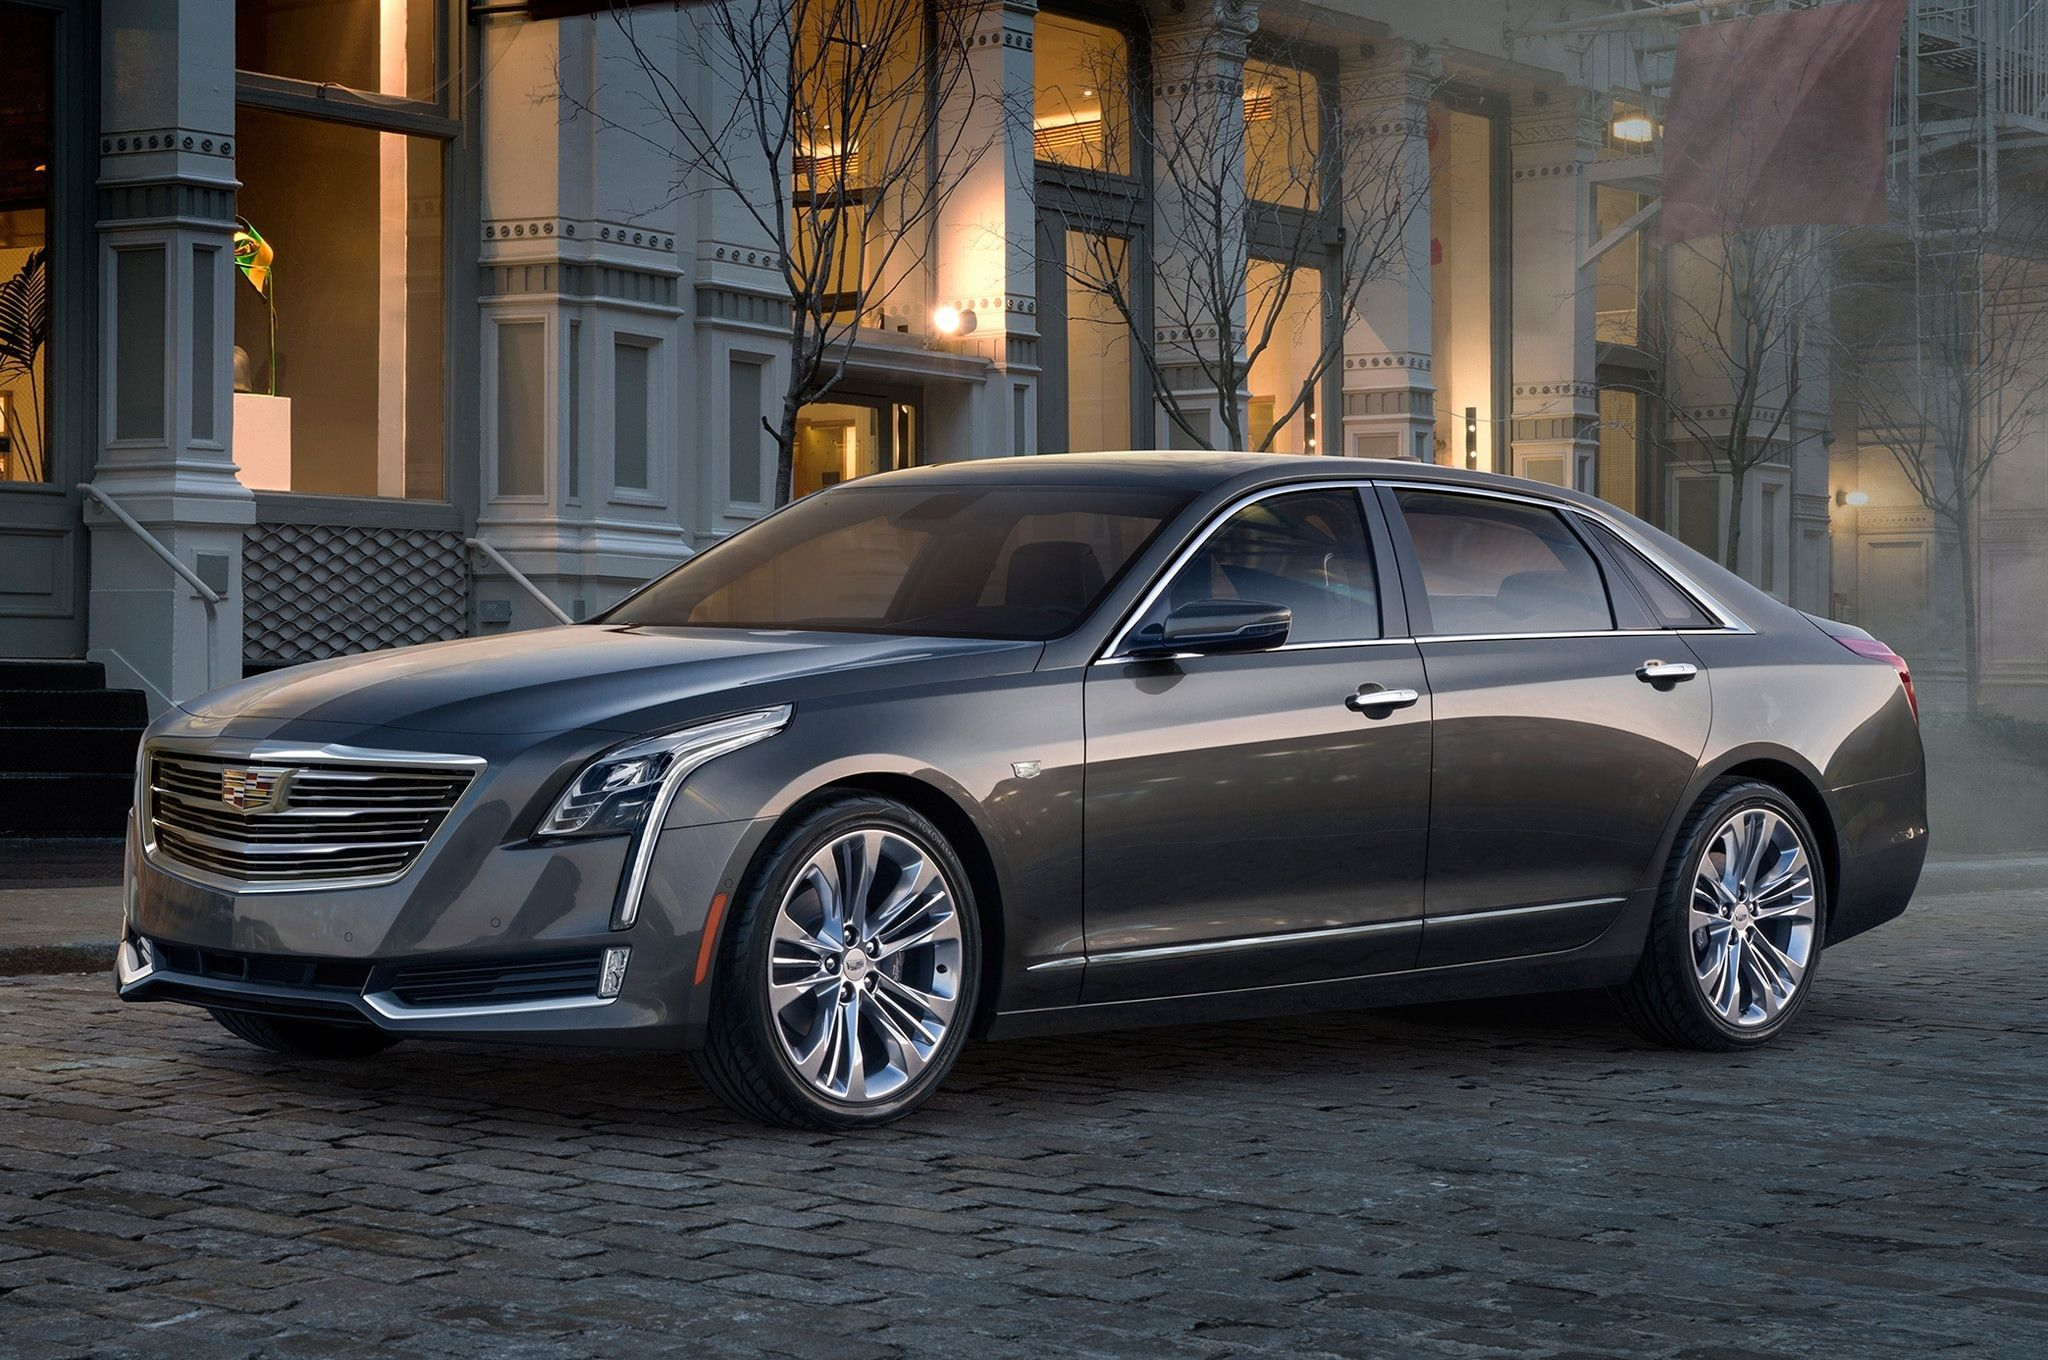 2020 Cadillac LTS Spesification